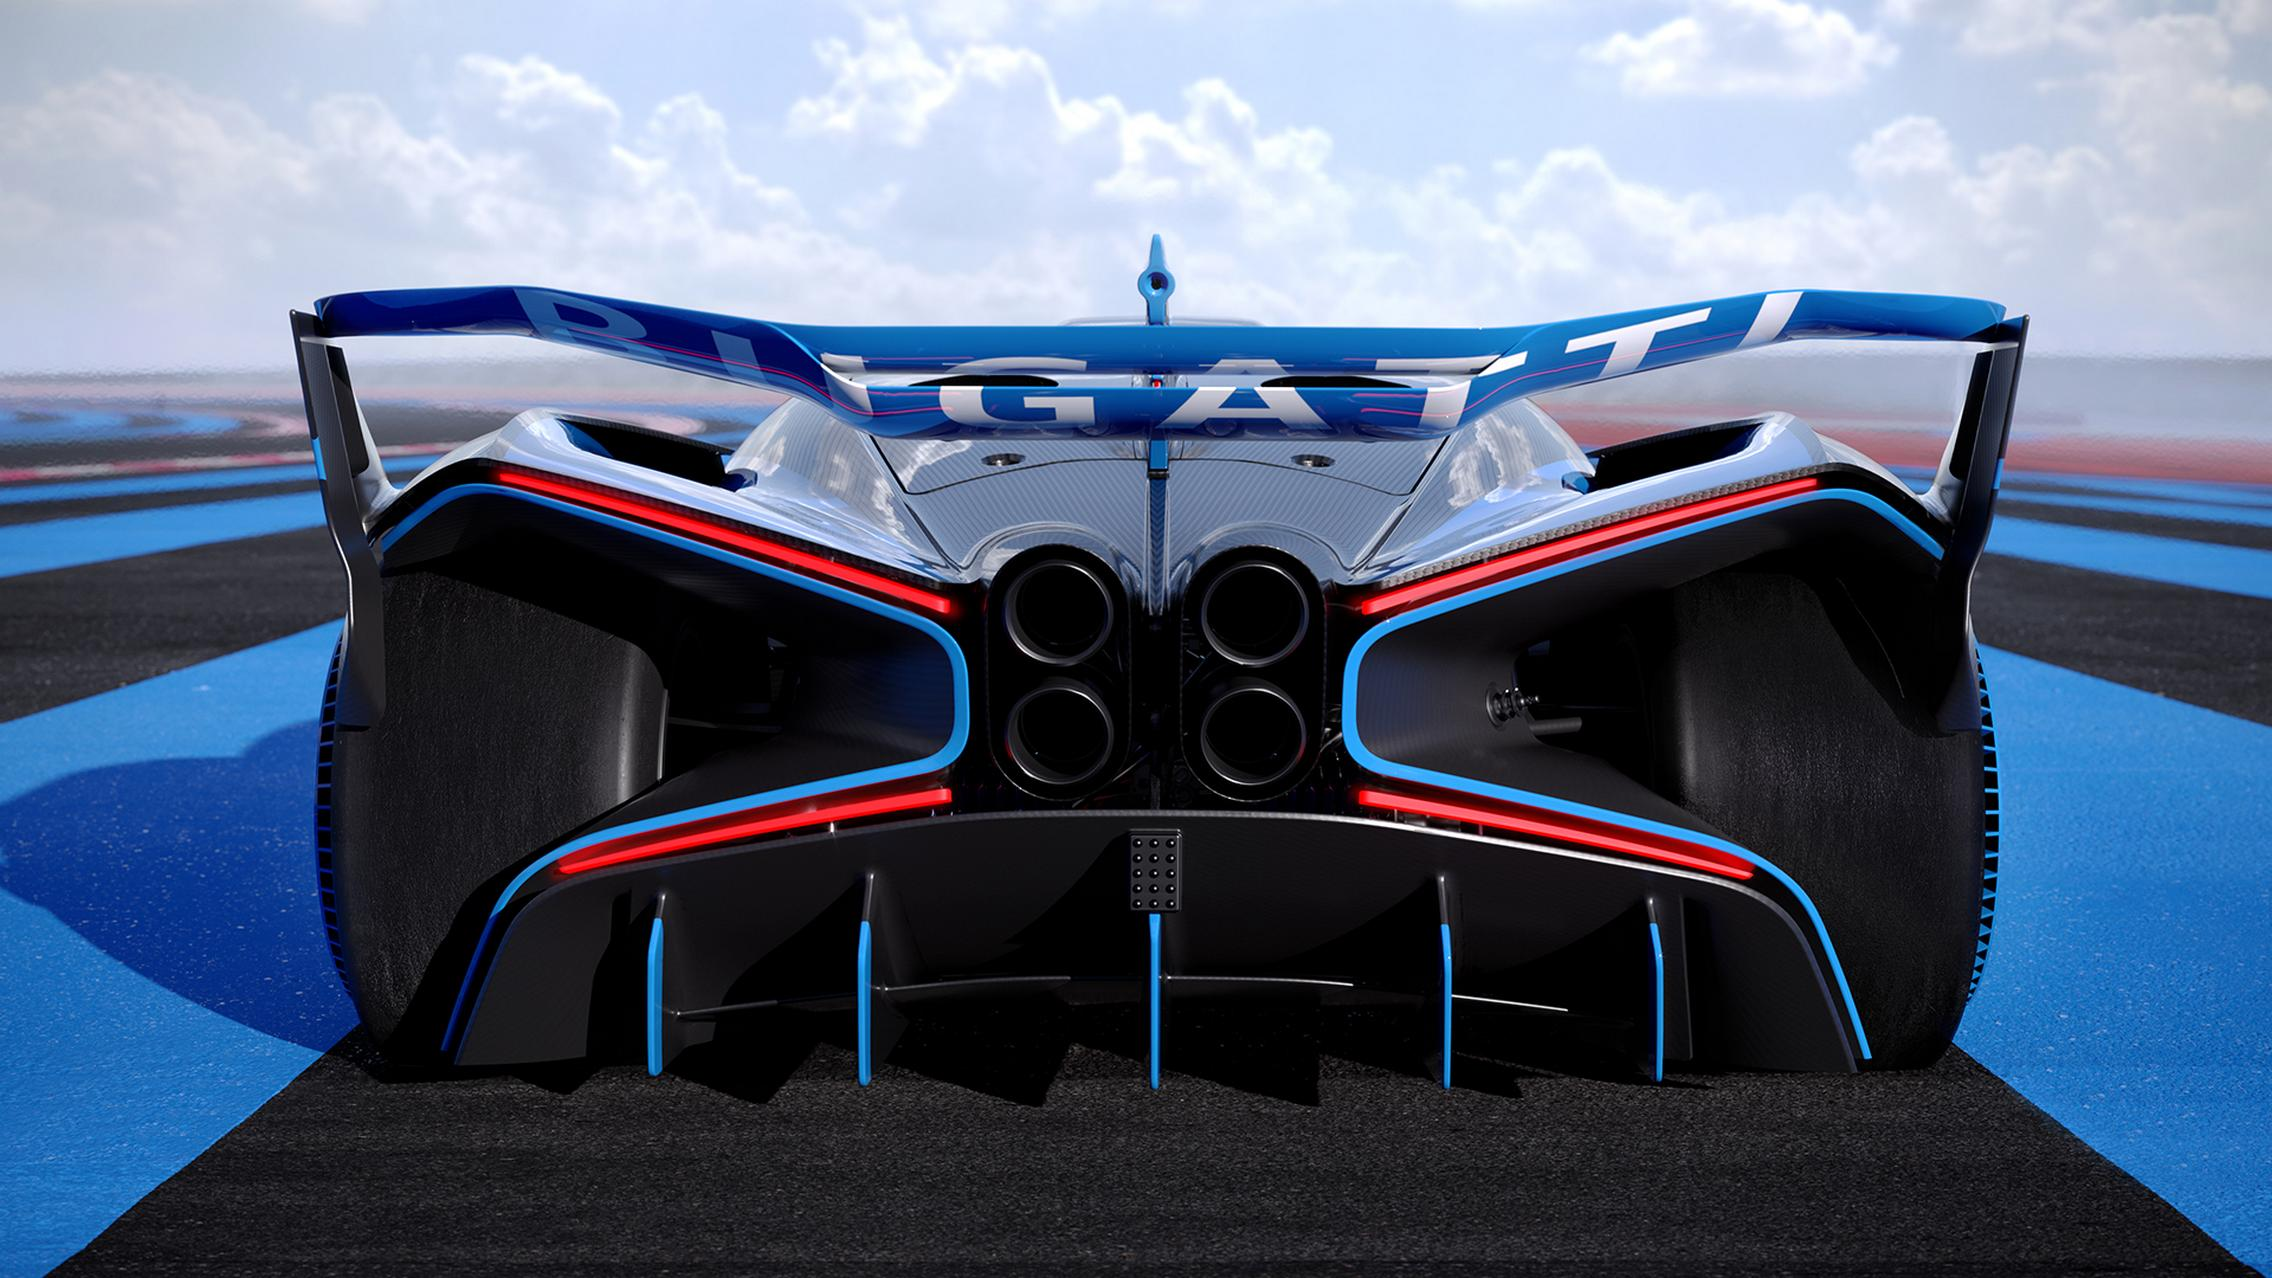 Bugatti Bolide rear lights